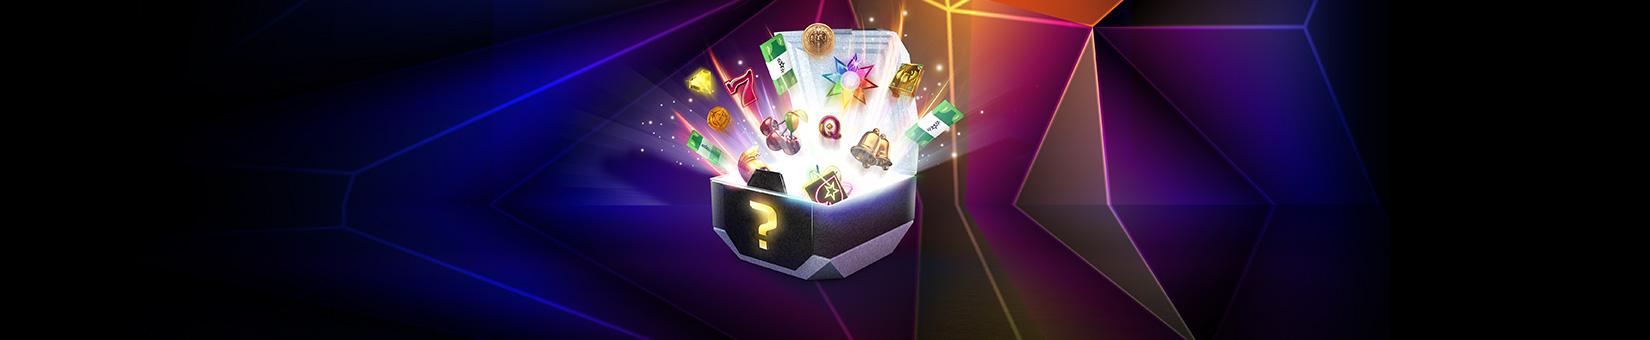 Glosario de poker bono garantizado futbol-30335